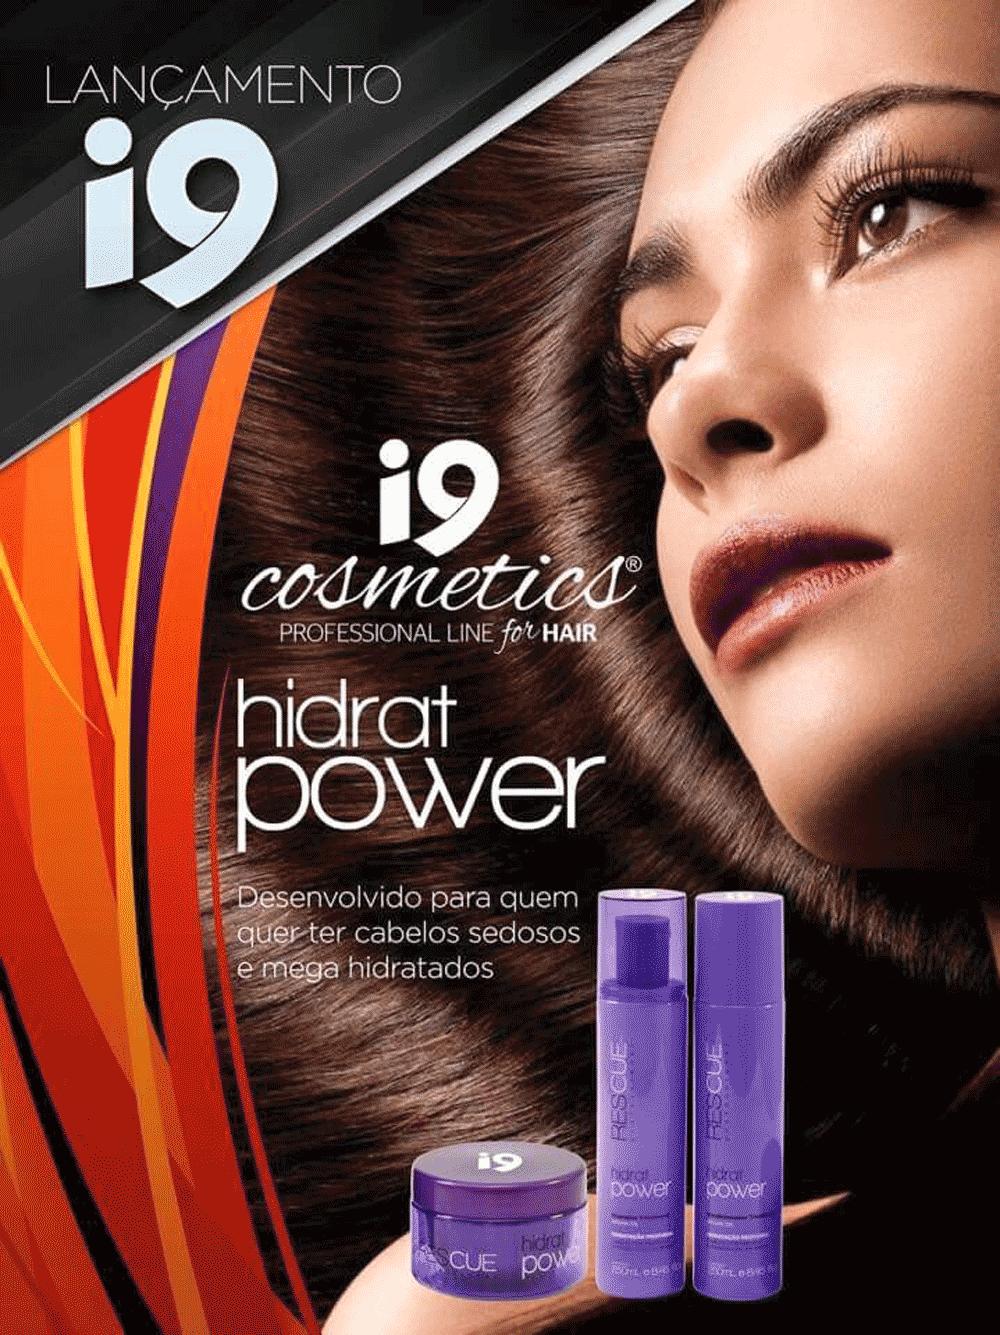 hidrat power i9life